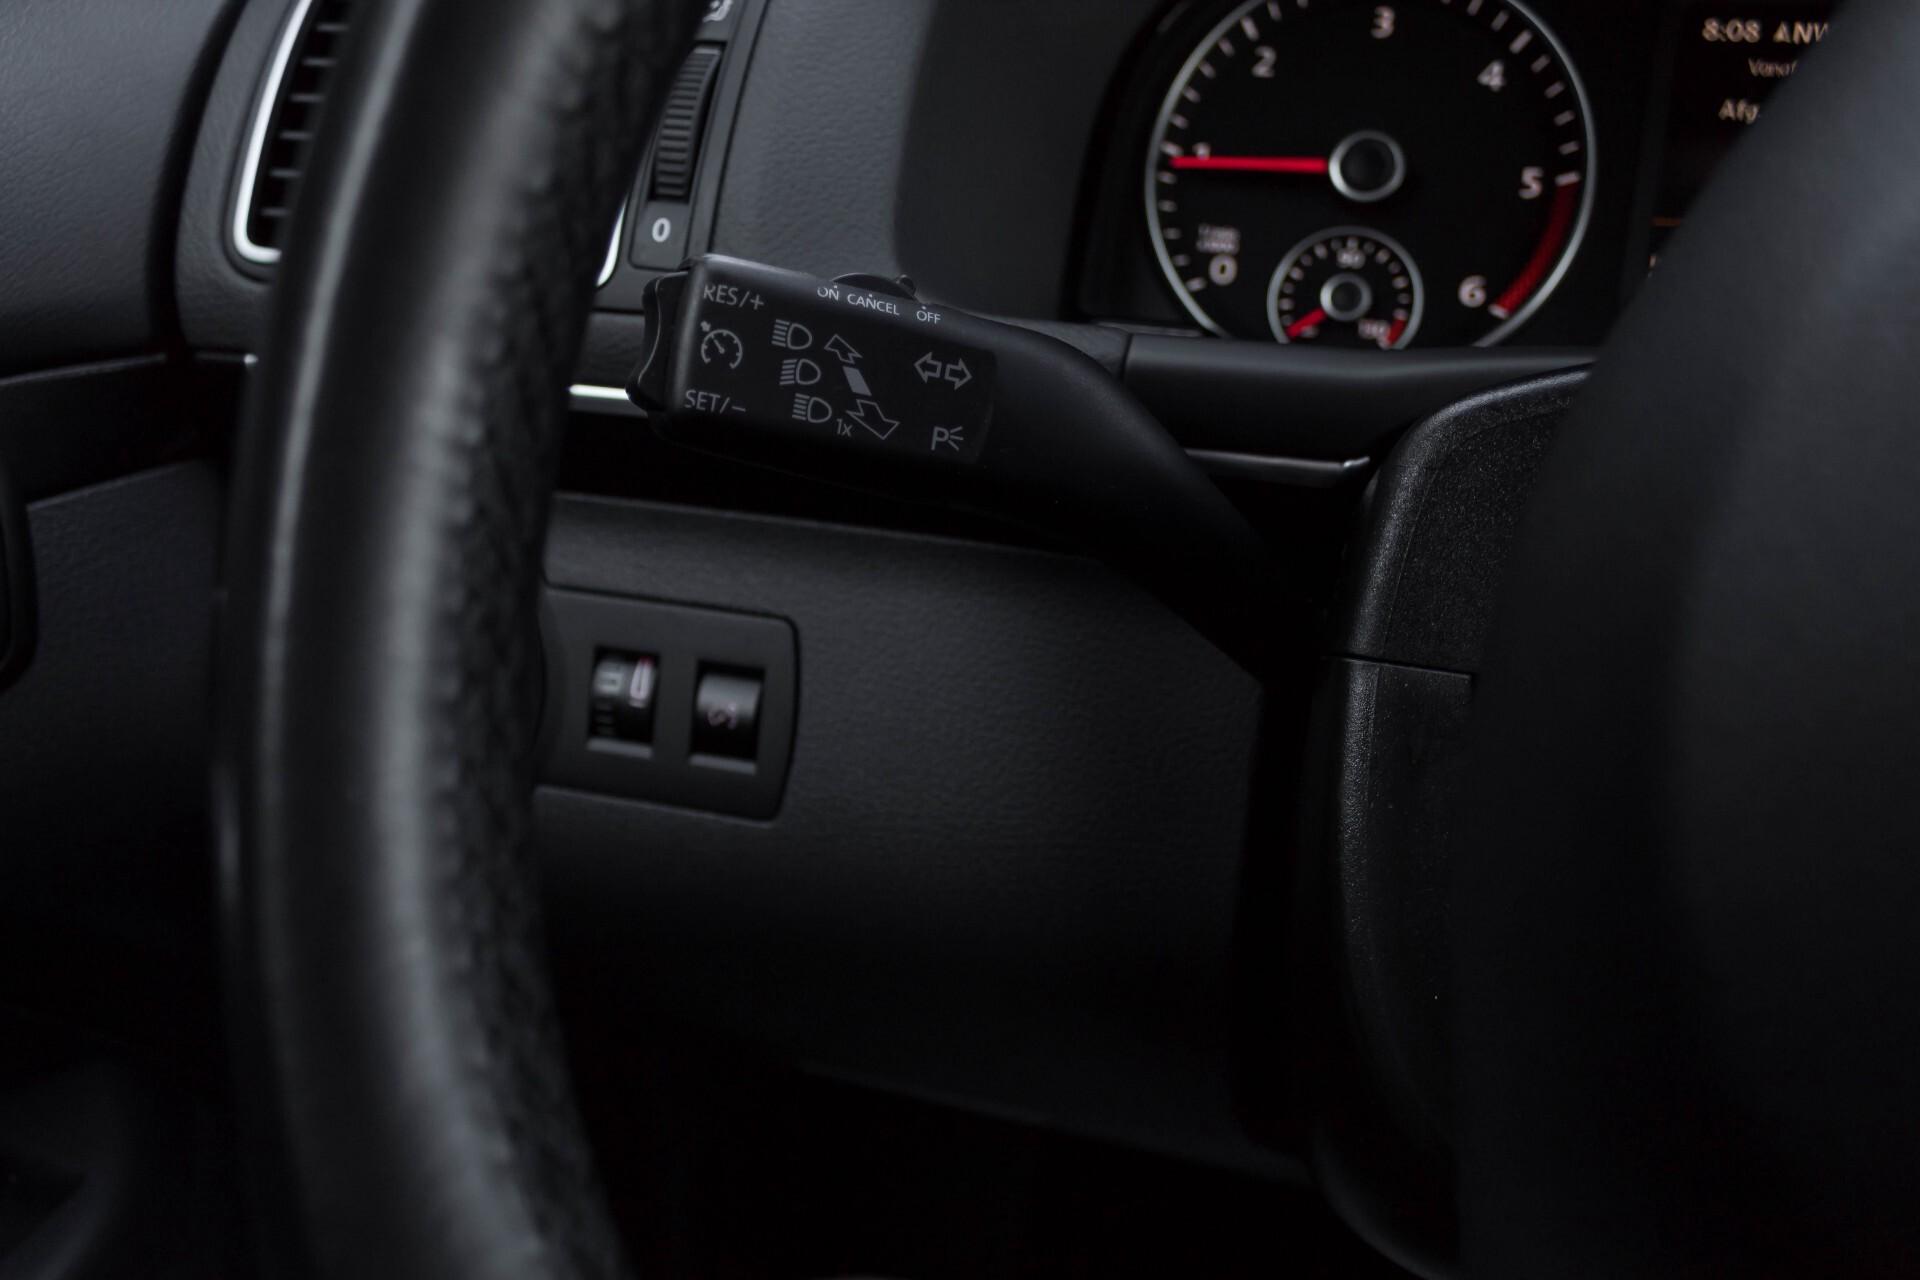 Volkswagen Touran 2.0 TDI Highline 7Persoons 177pk Panorama/Leder/Navi/Camera/Verw-Stln/Trhk/ECC/Xenon Aut Foto 12